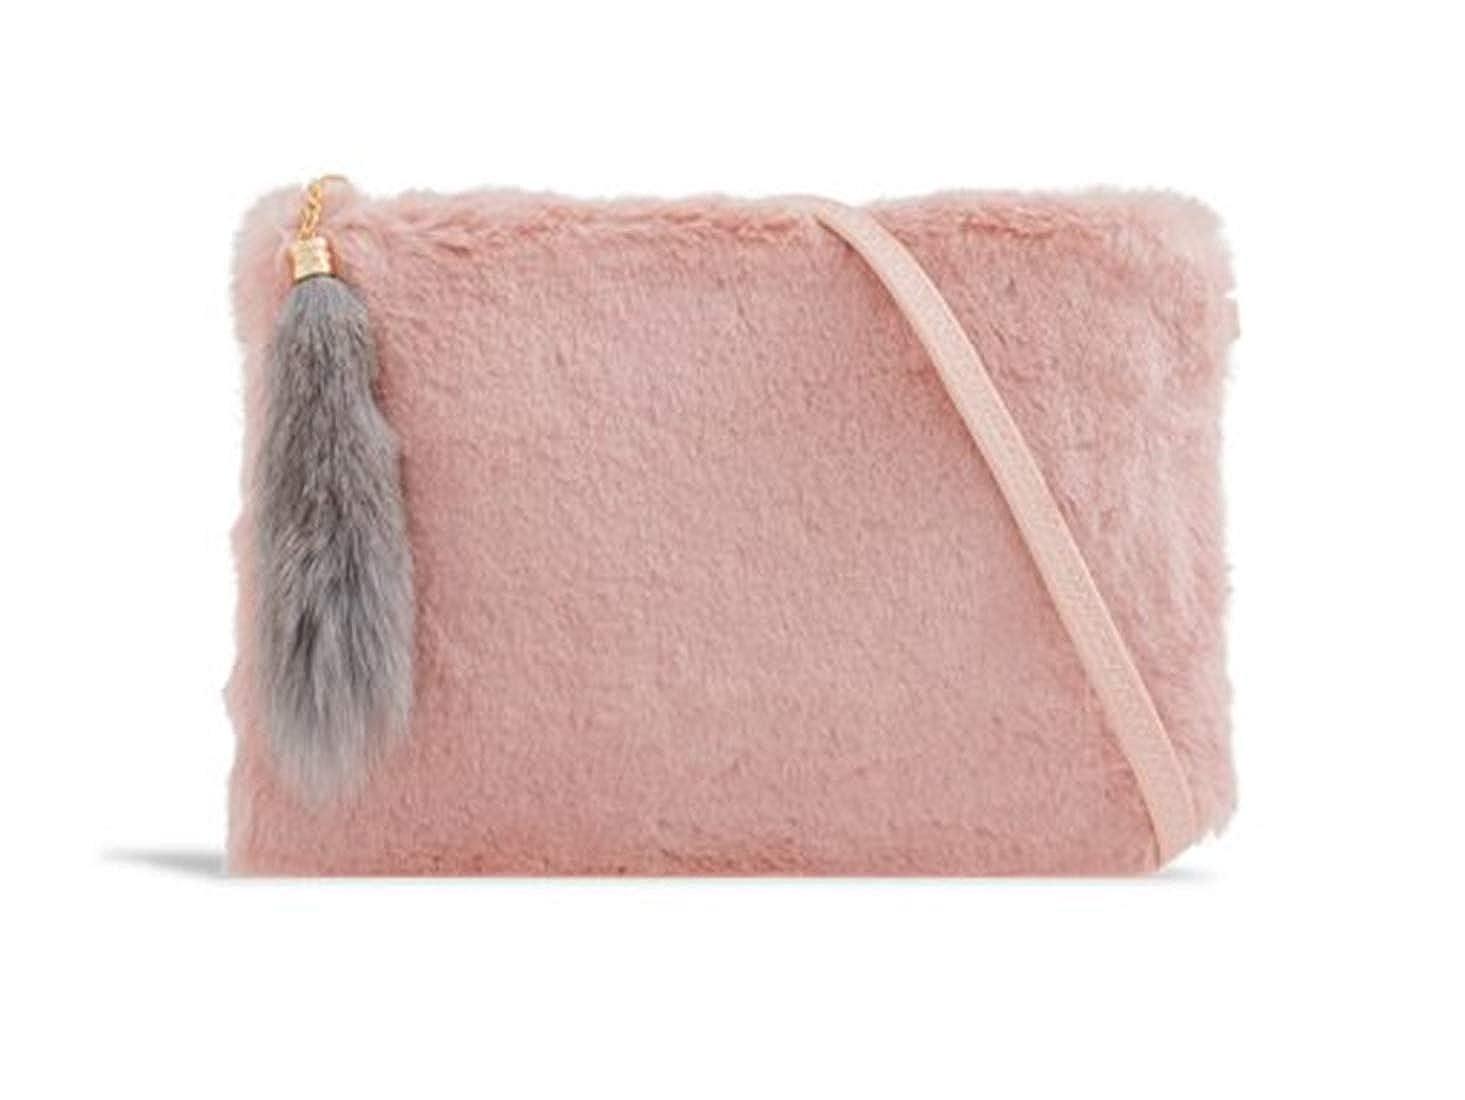 794754fb997 LeahWard Women s Faux Fur Clutch Bag Cross Body Handbag Wedding Night Out  Purse 2333 (Black)  Amazon.co.uk  Shoes   Bags